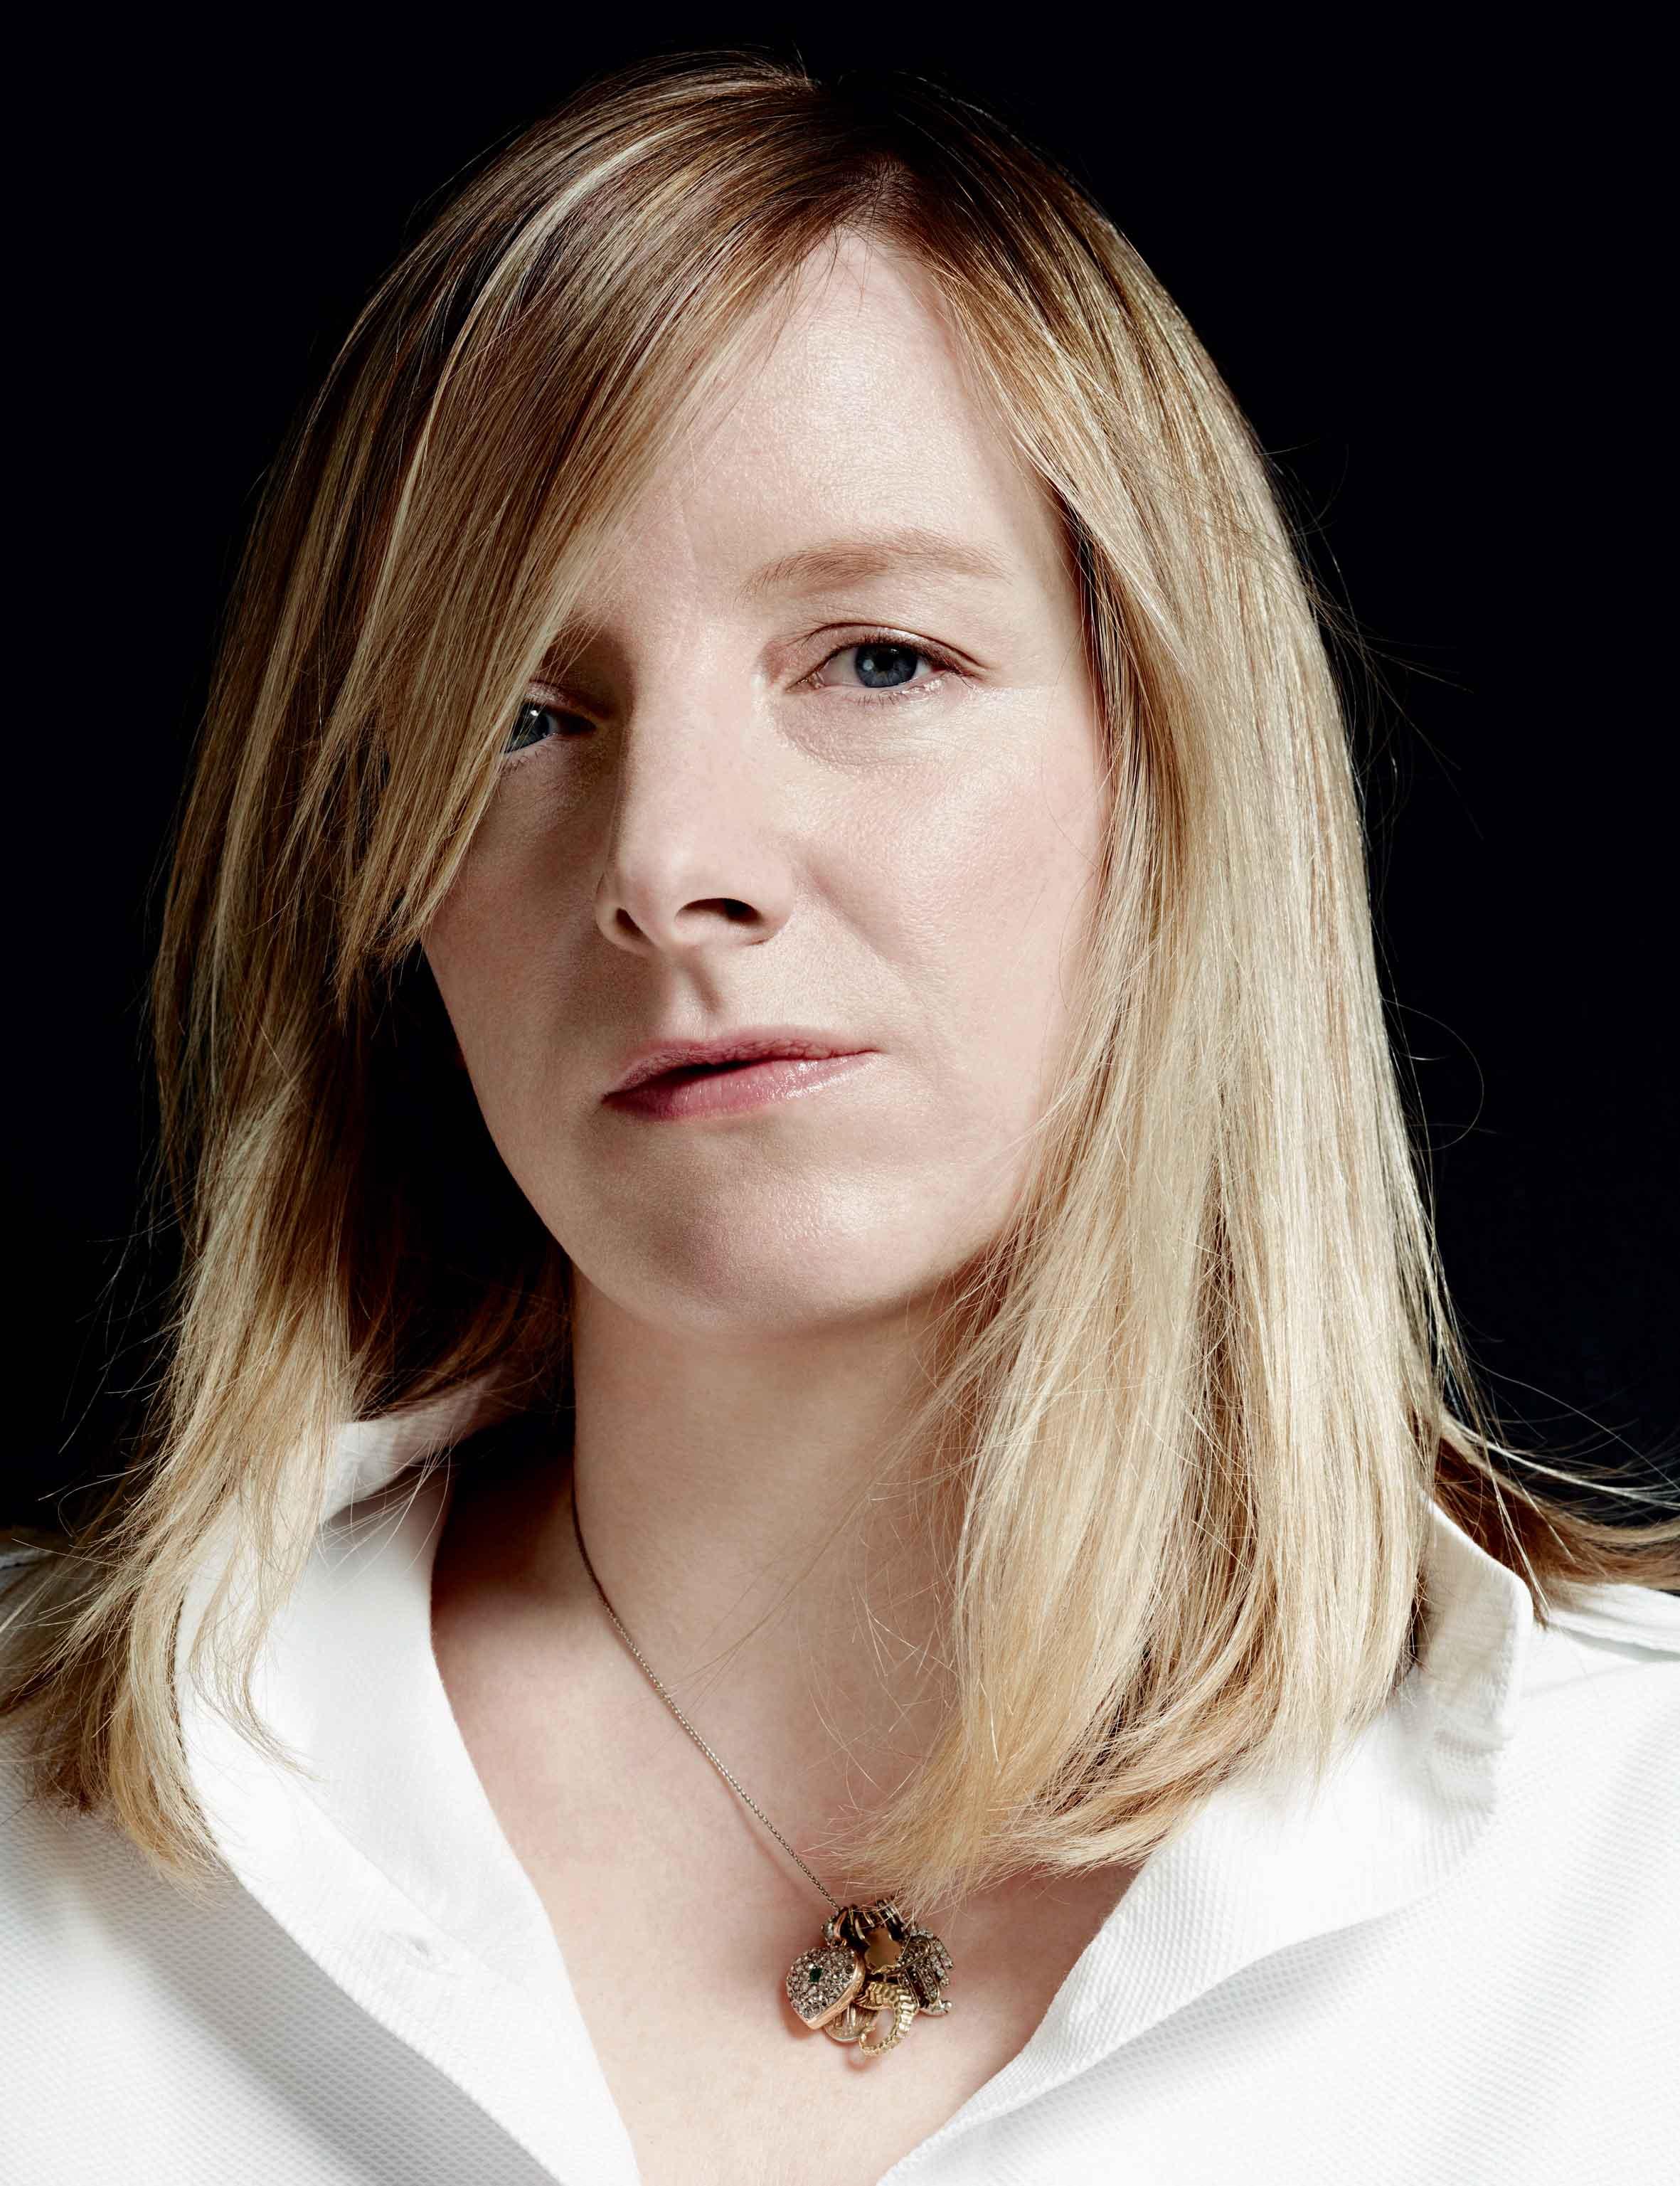 Rencontre avec Sarah Burton, directrice artistique d'Alexander McQueen